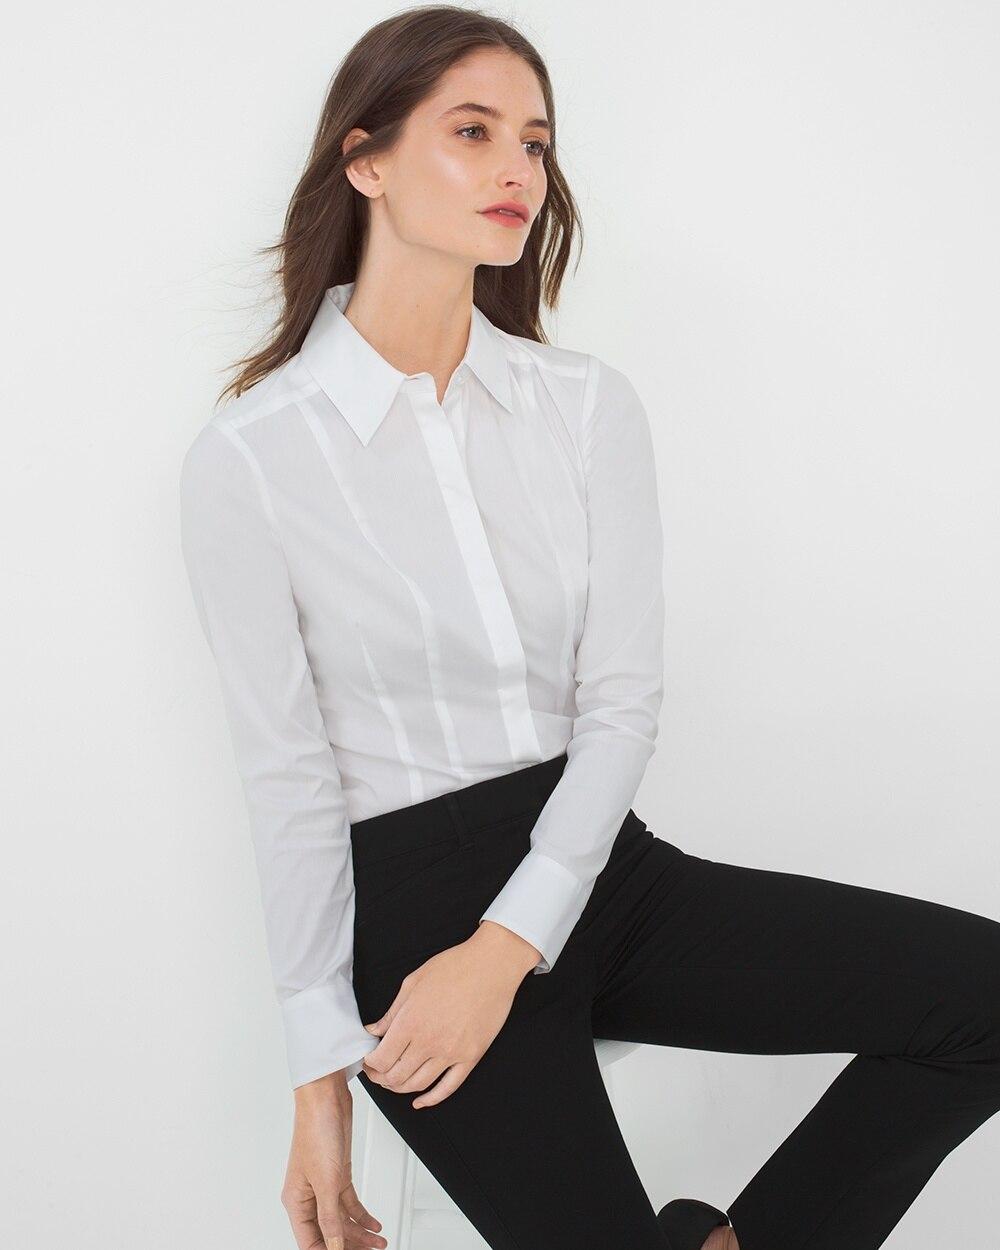 14aeeef69baddd White Poplin Shirt - White House Black Market